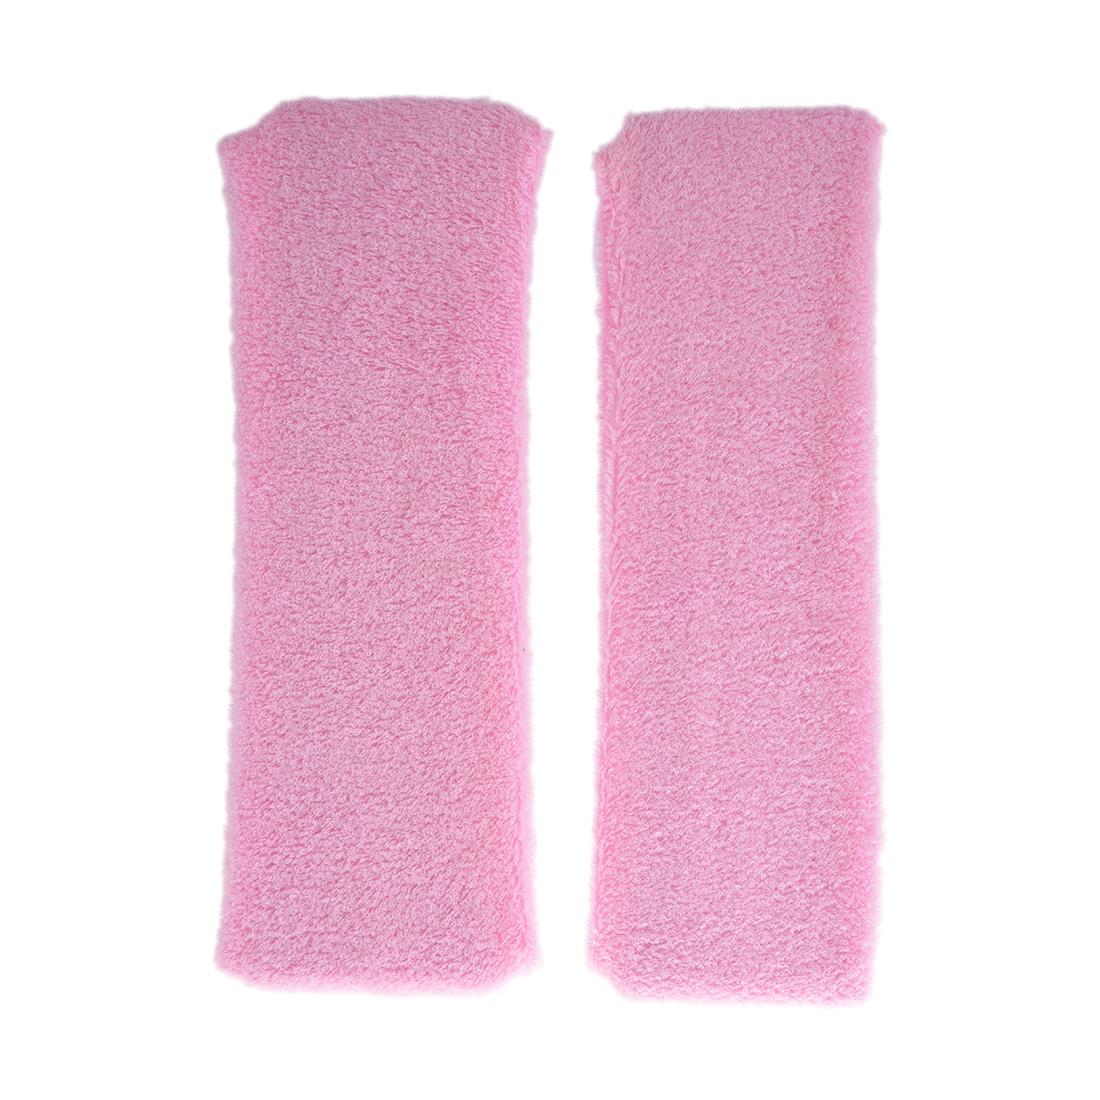 Z2G3 10X 2Pcs Light Pink Athletic Sports Terry Stretchy Sweatband Headband Z2G3